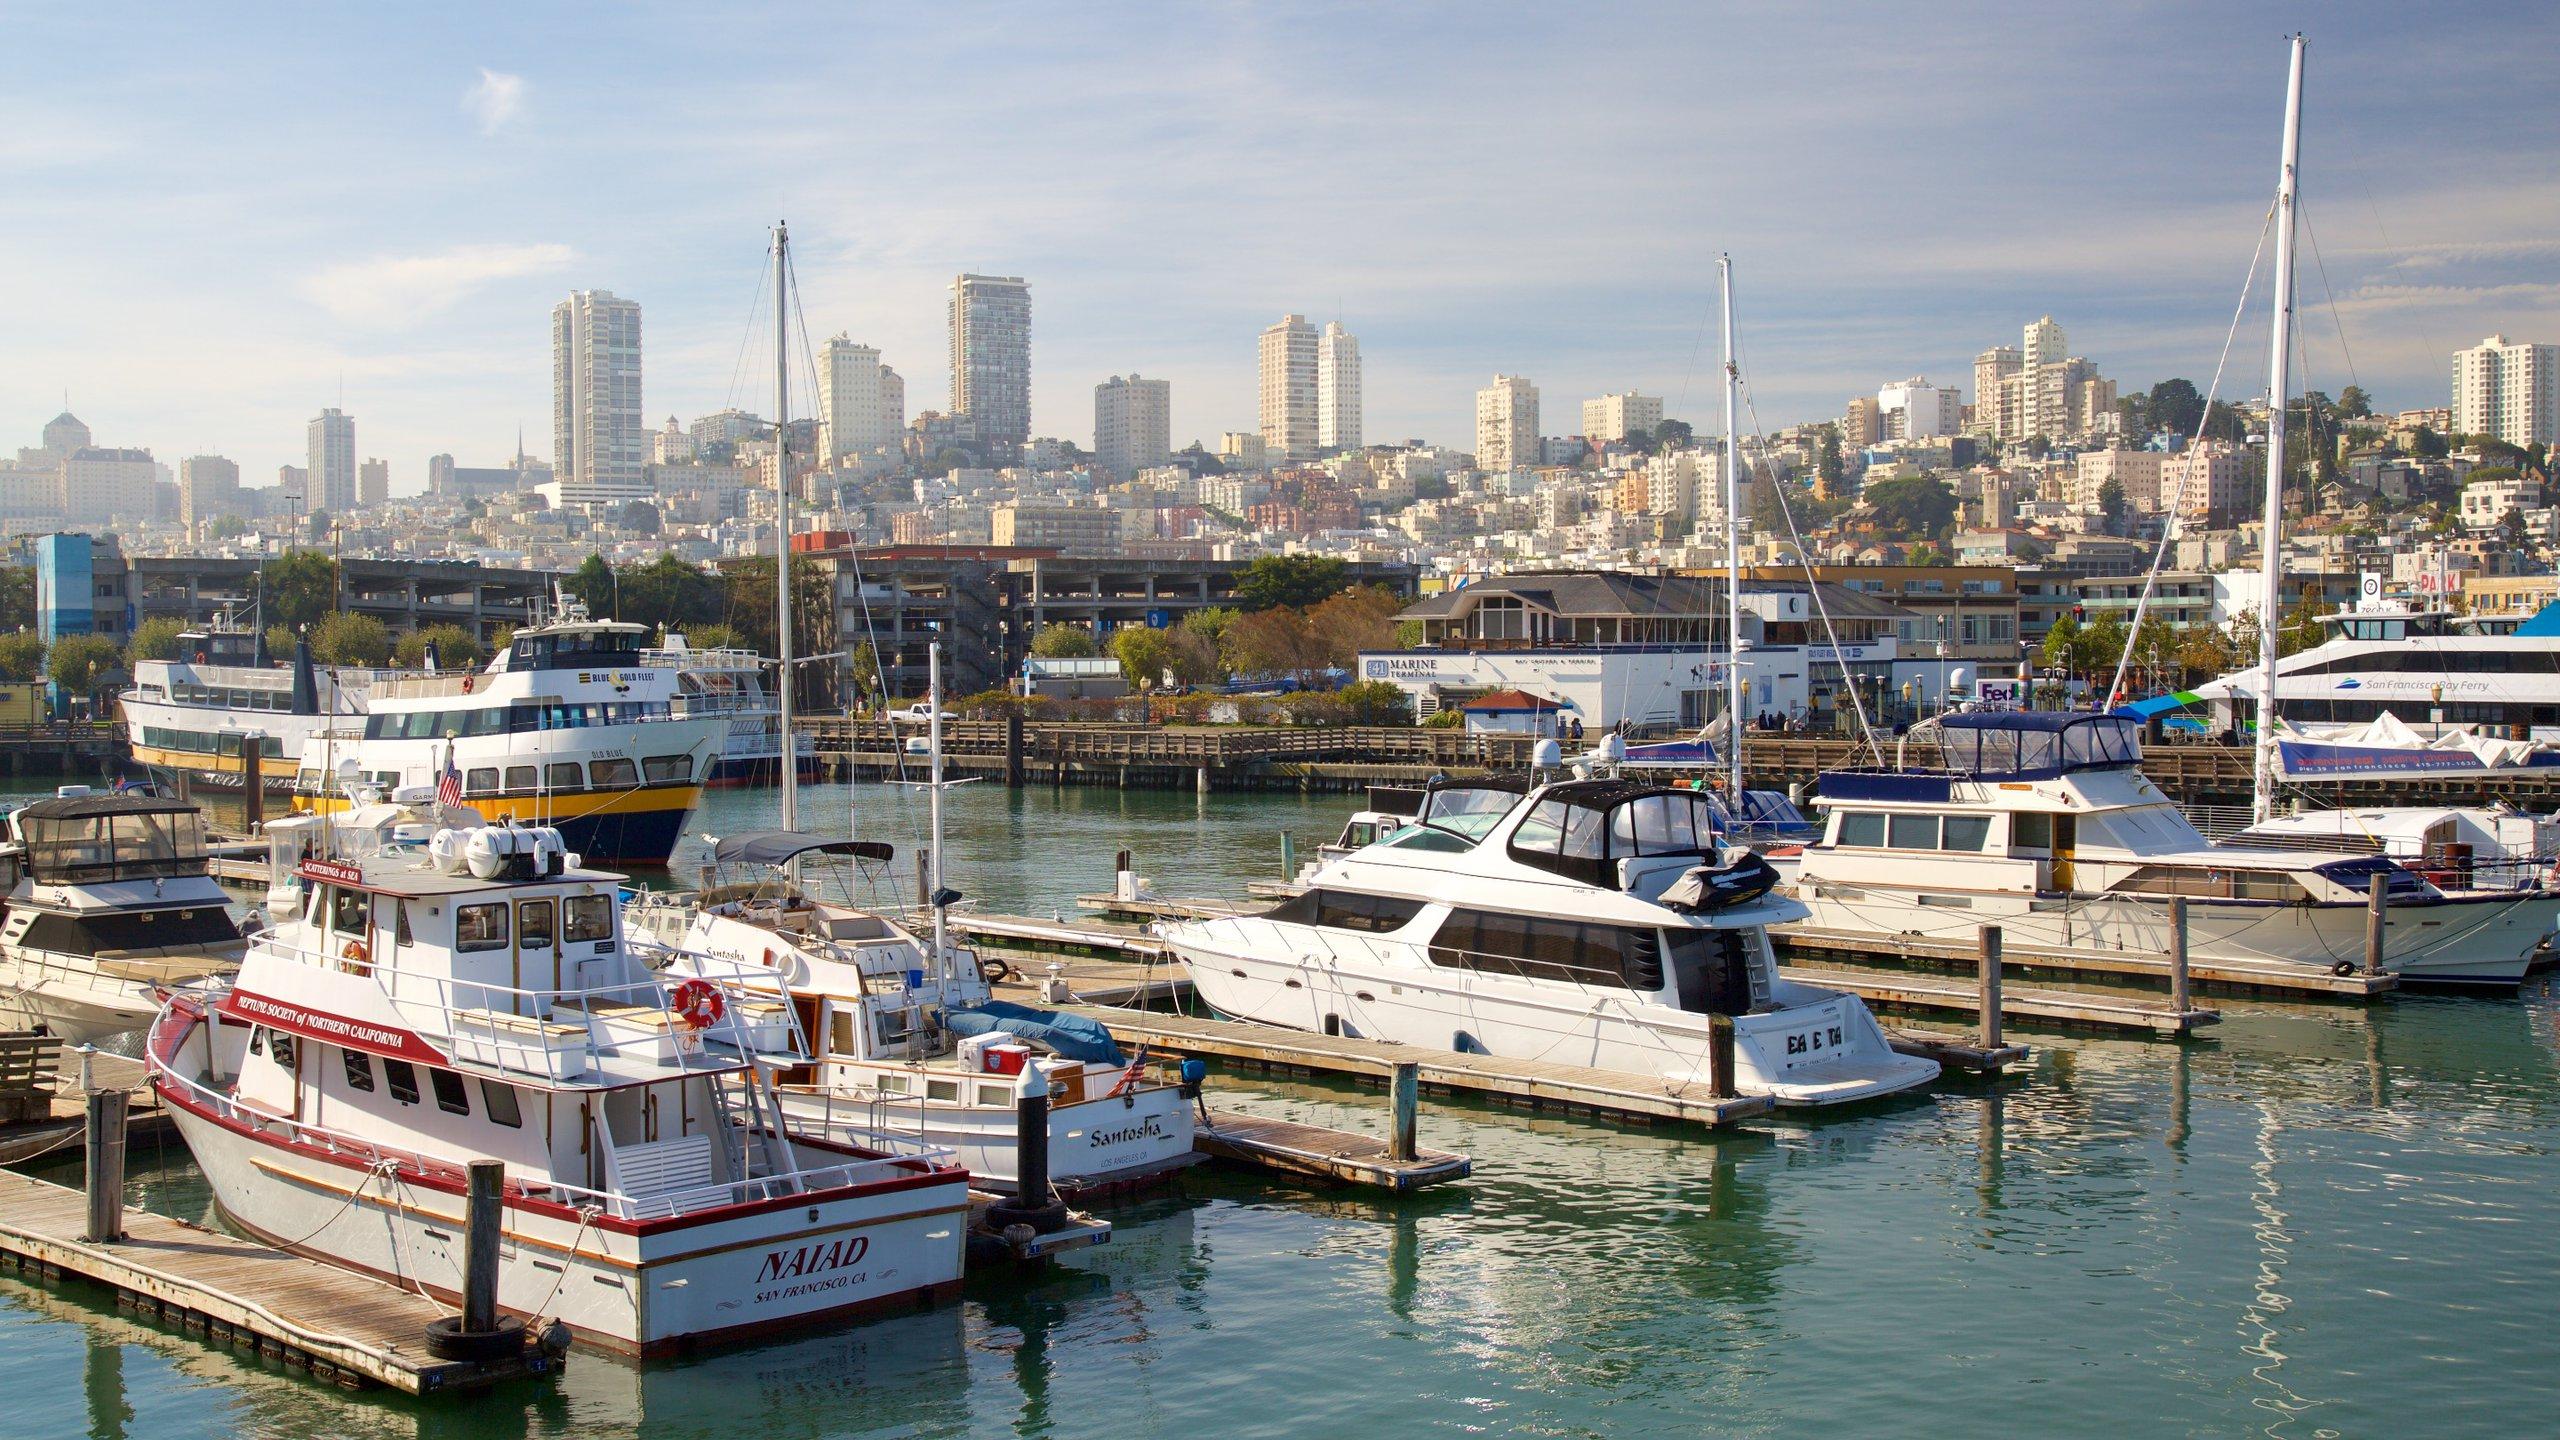 Fisherman's Wharf, San Francisco, California, United States of America